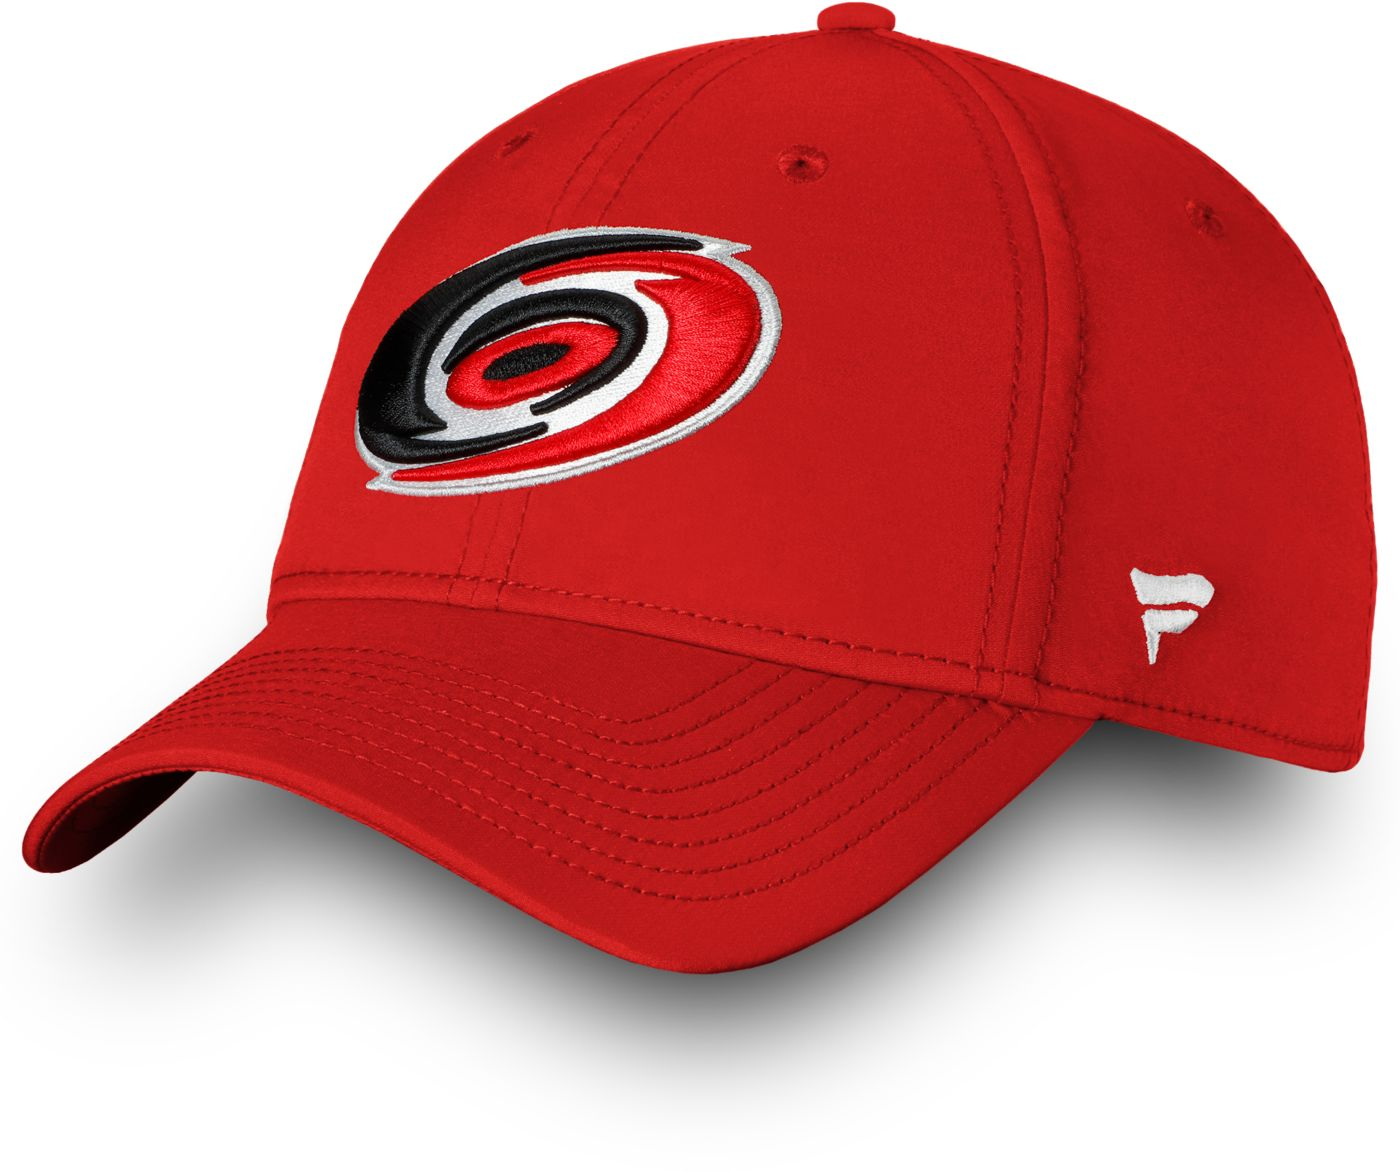 NHL Men's Carolina Hurricanes Elevated Speed Flex Hat